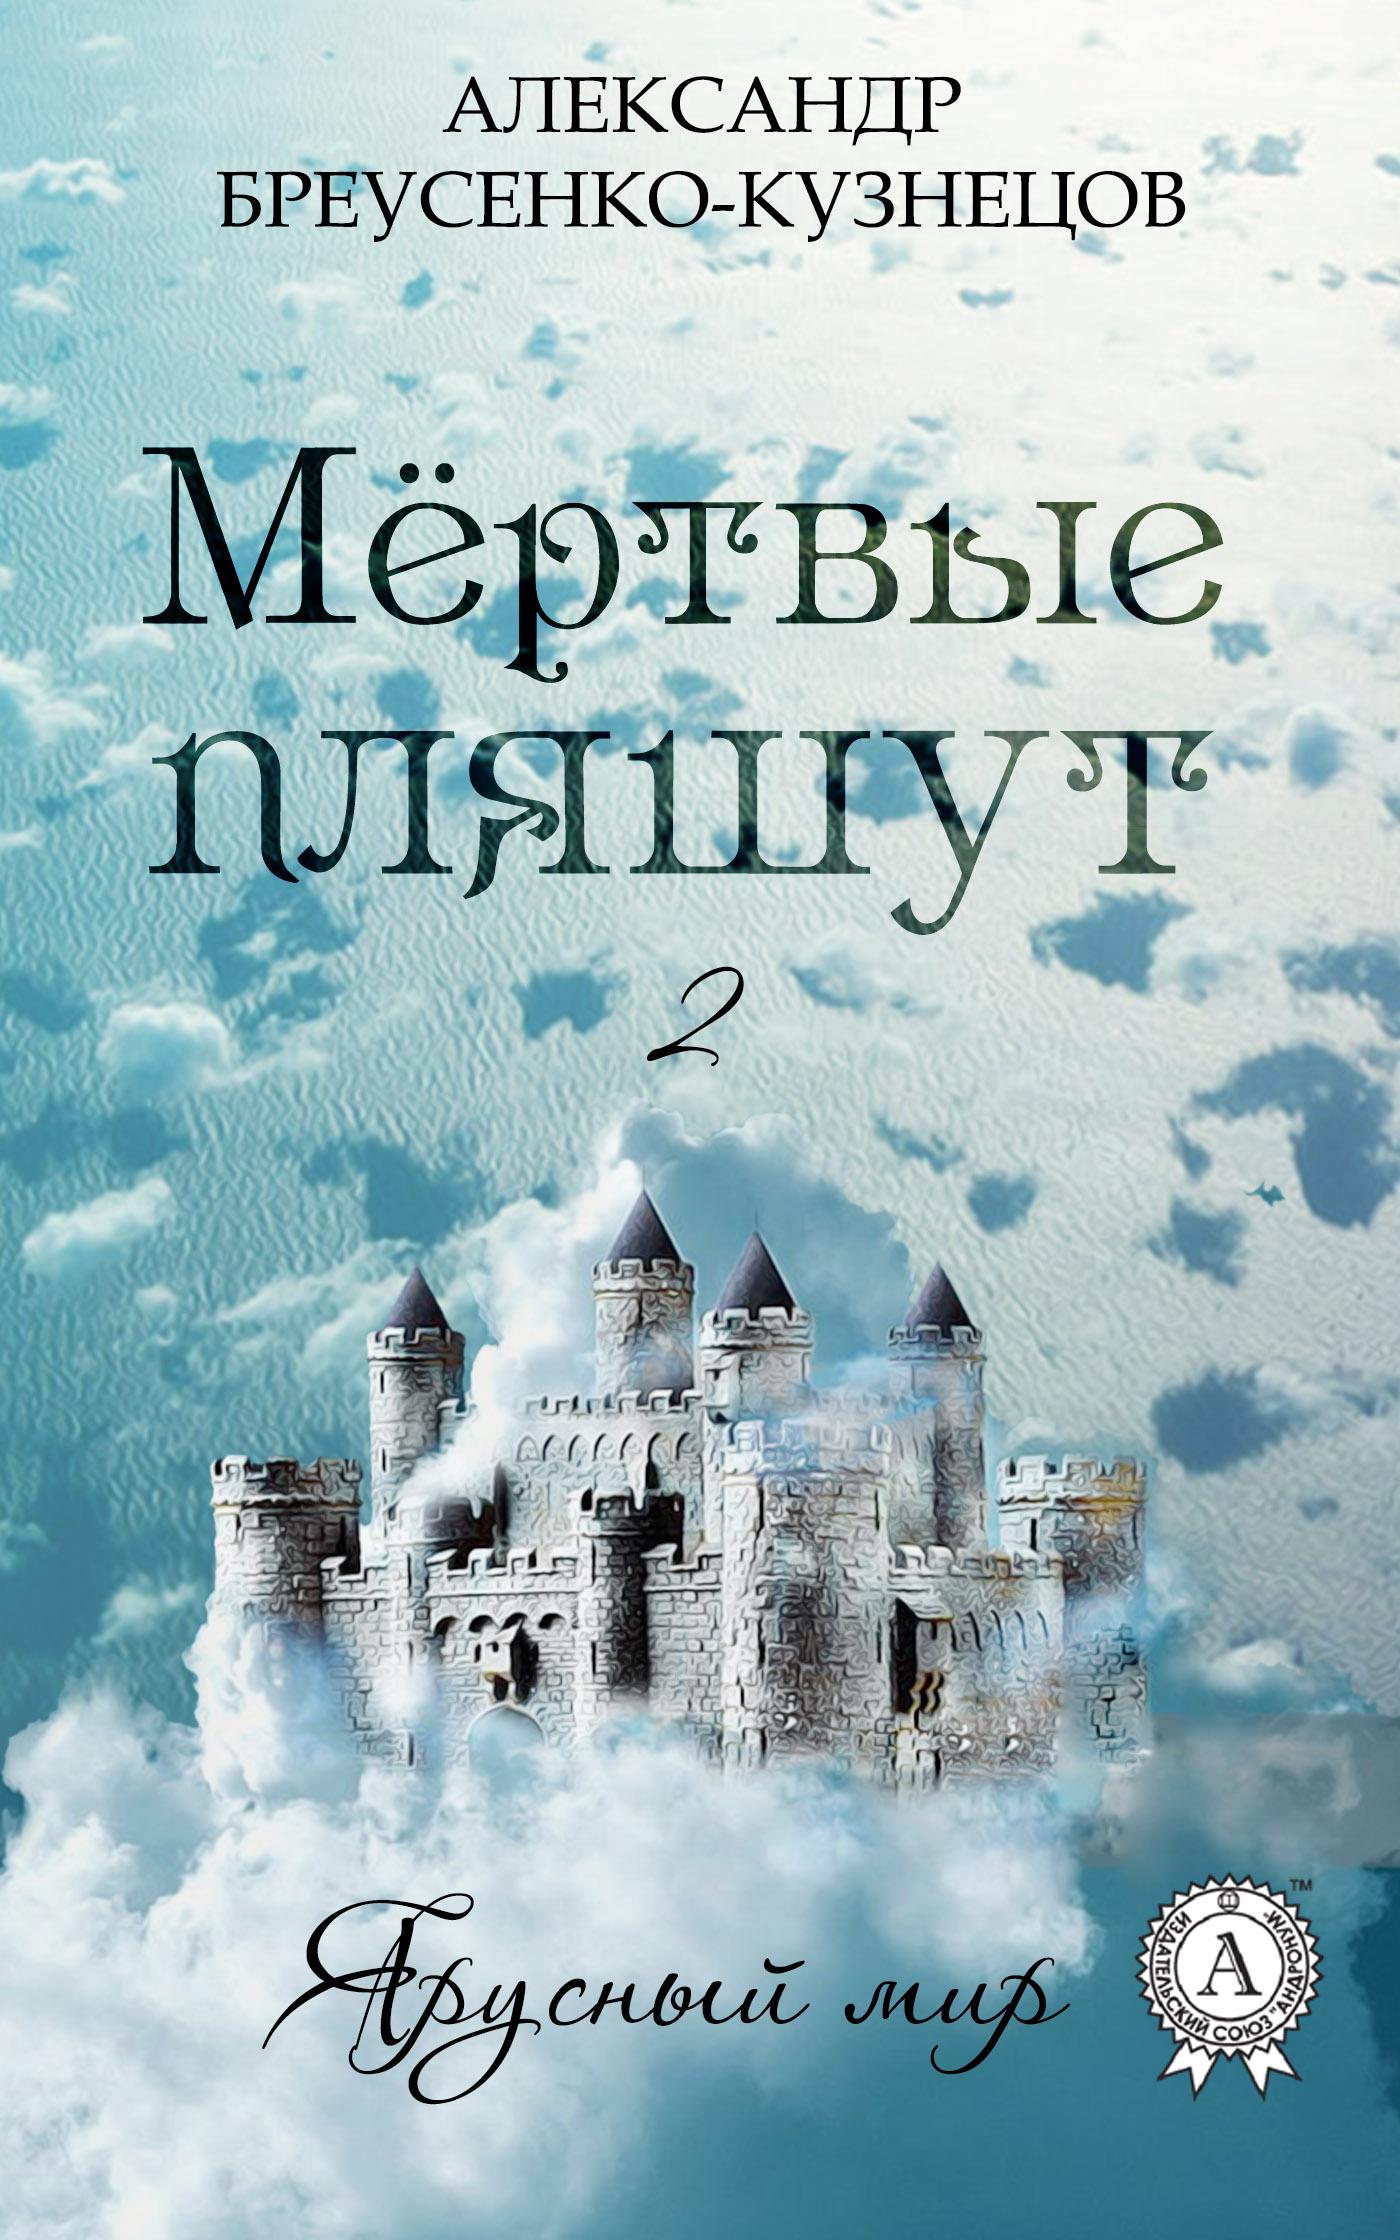 cover-2 Mjort 2.jpg